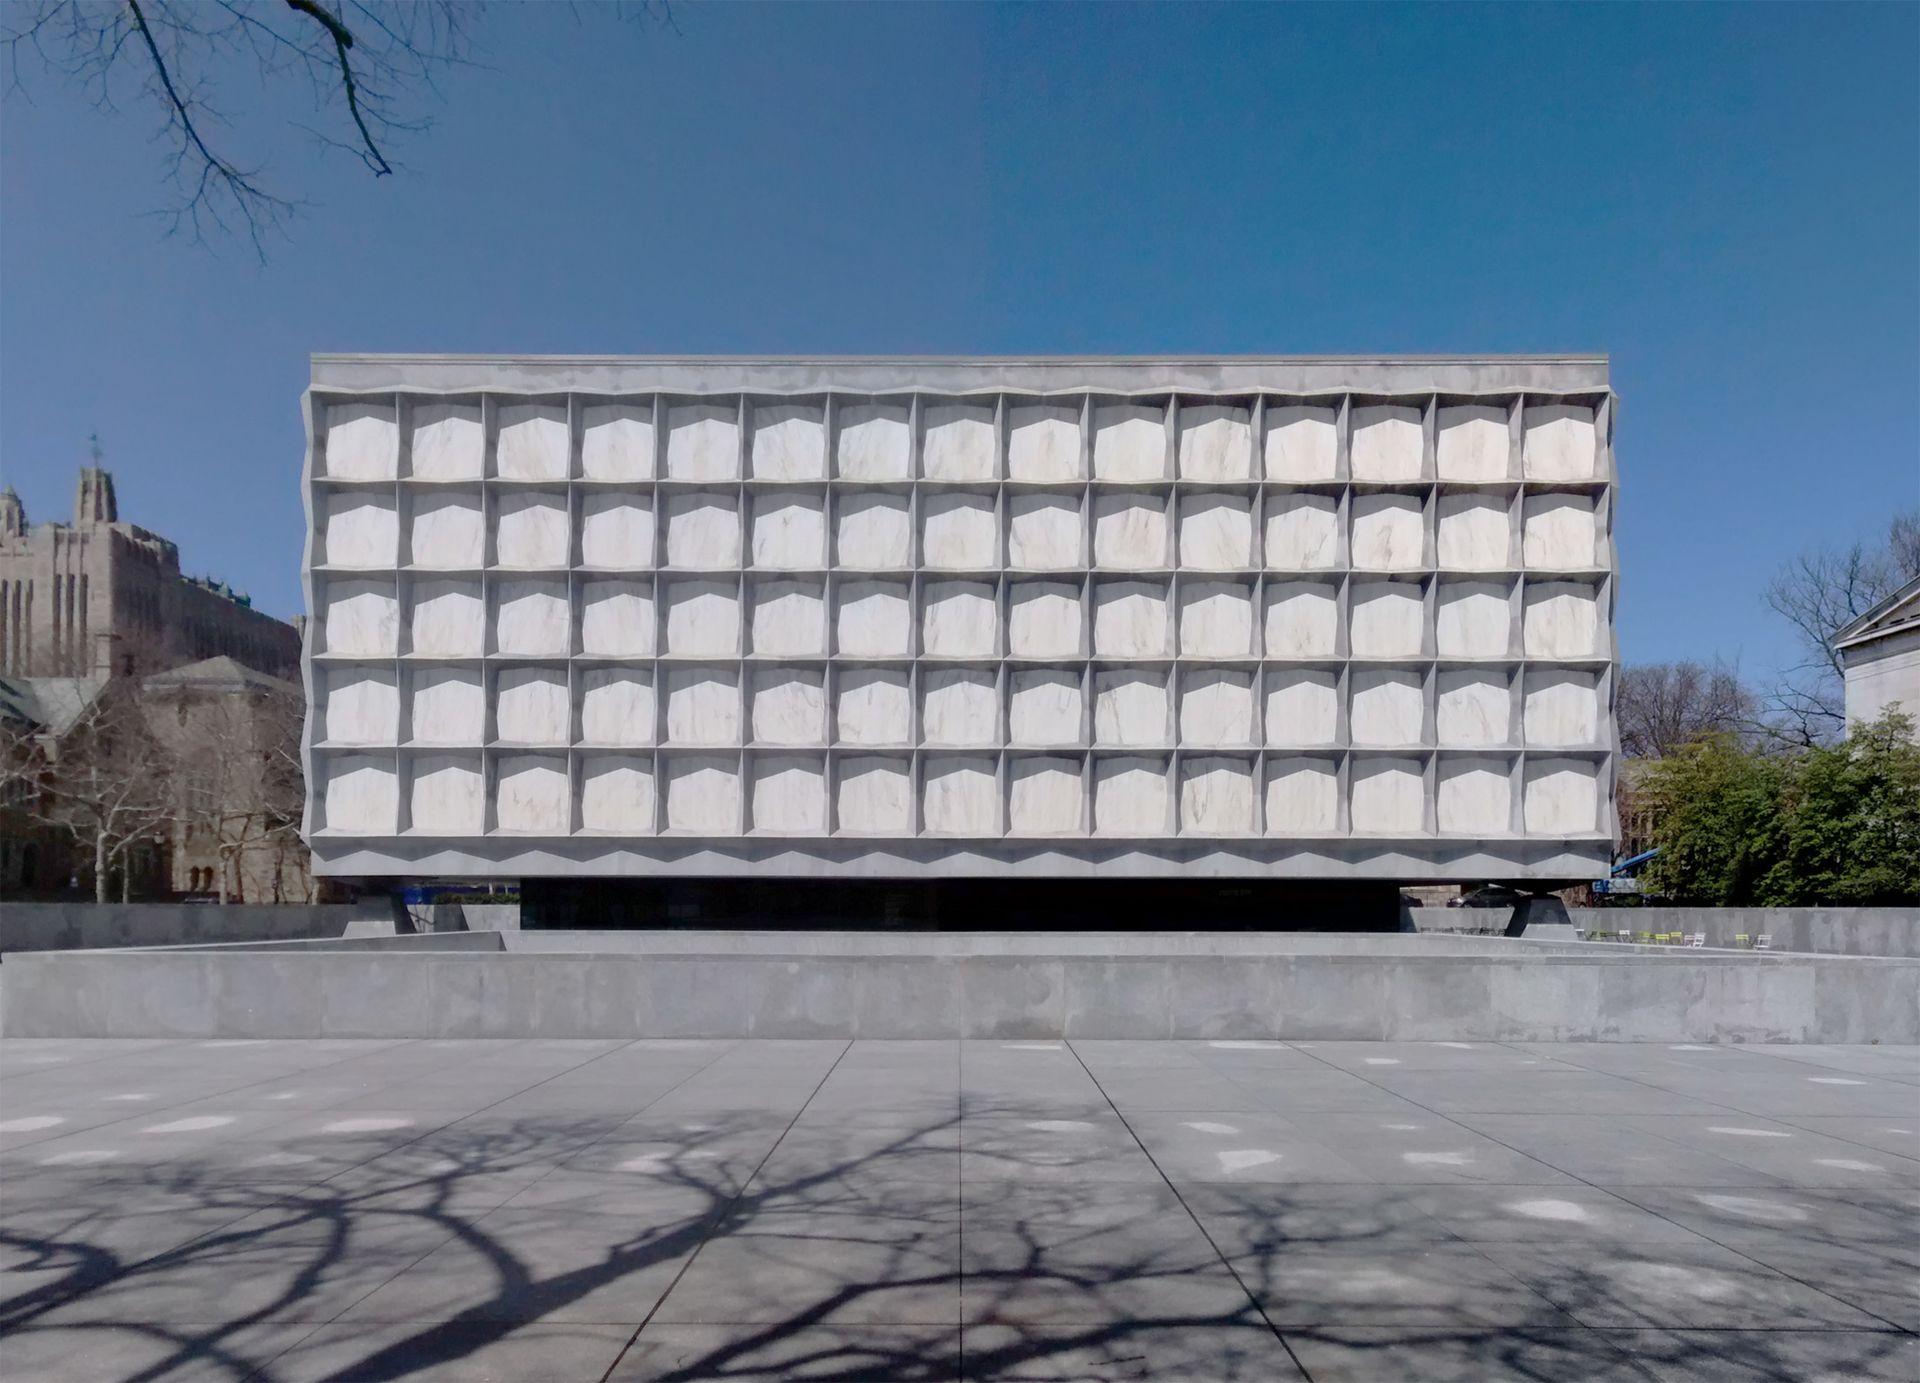 Beinecke-Rare-Book-Manuscript-Library-Yale-University-Hewitt-Quadrangle-New-Haven-Connecticut-Apr-2014-a.jpg